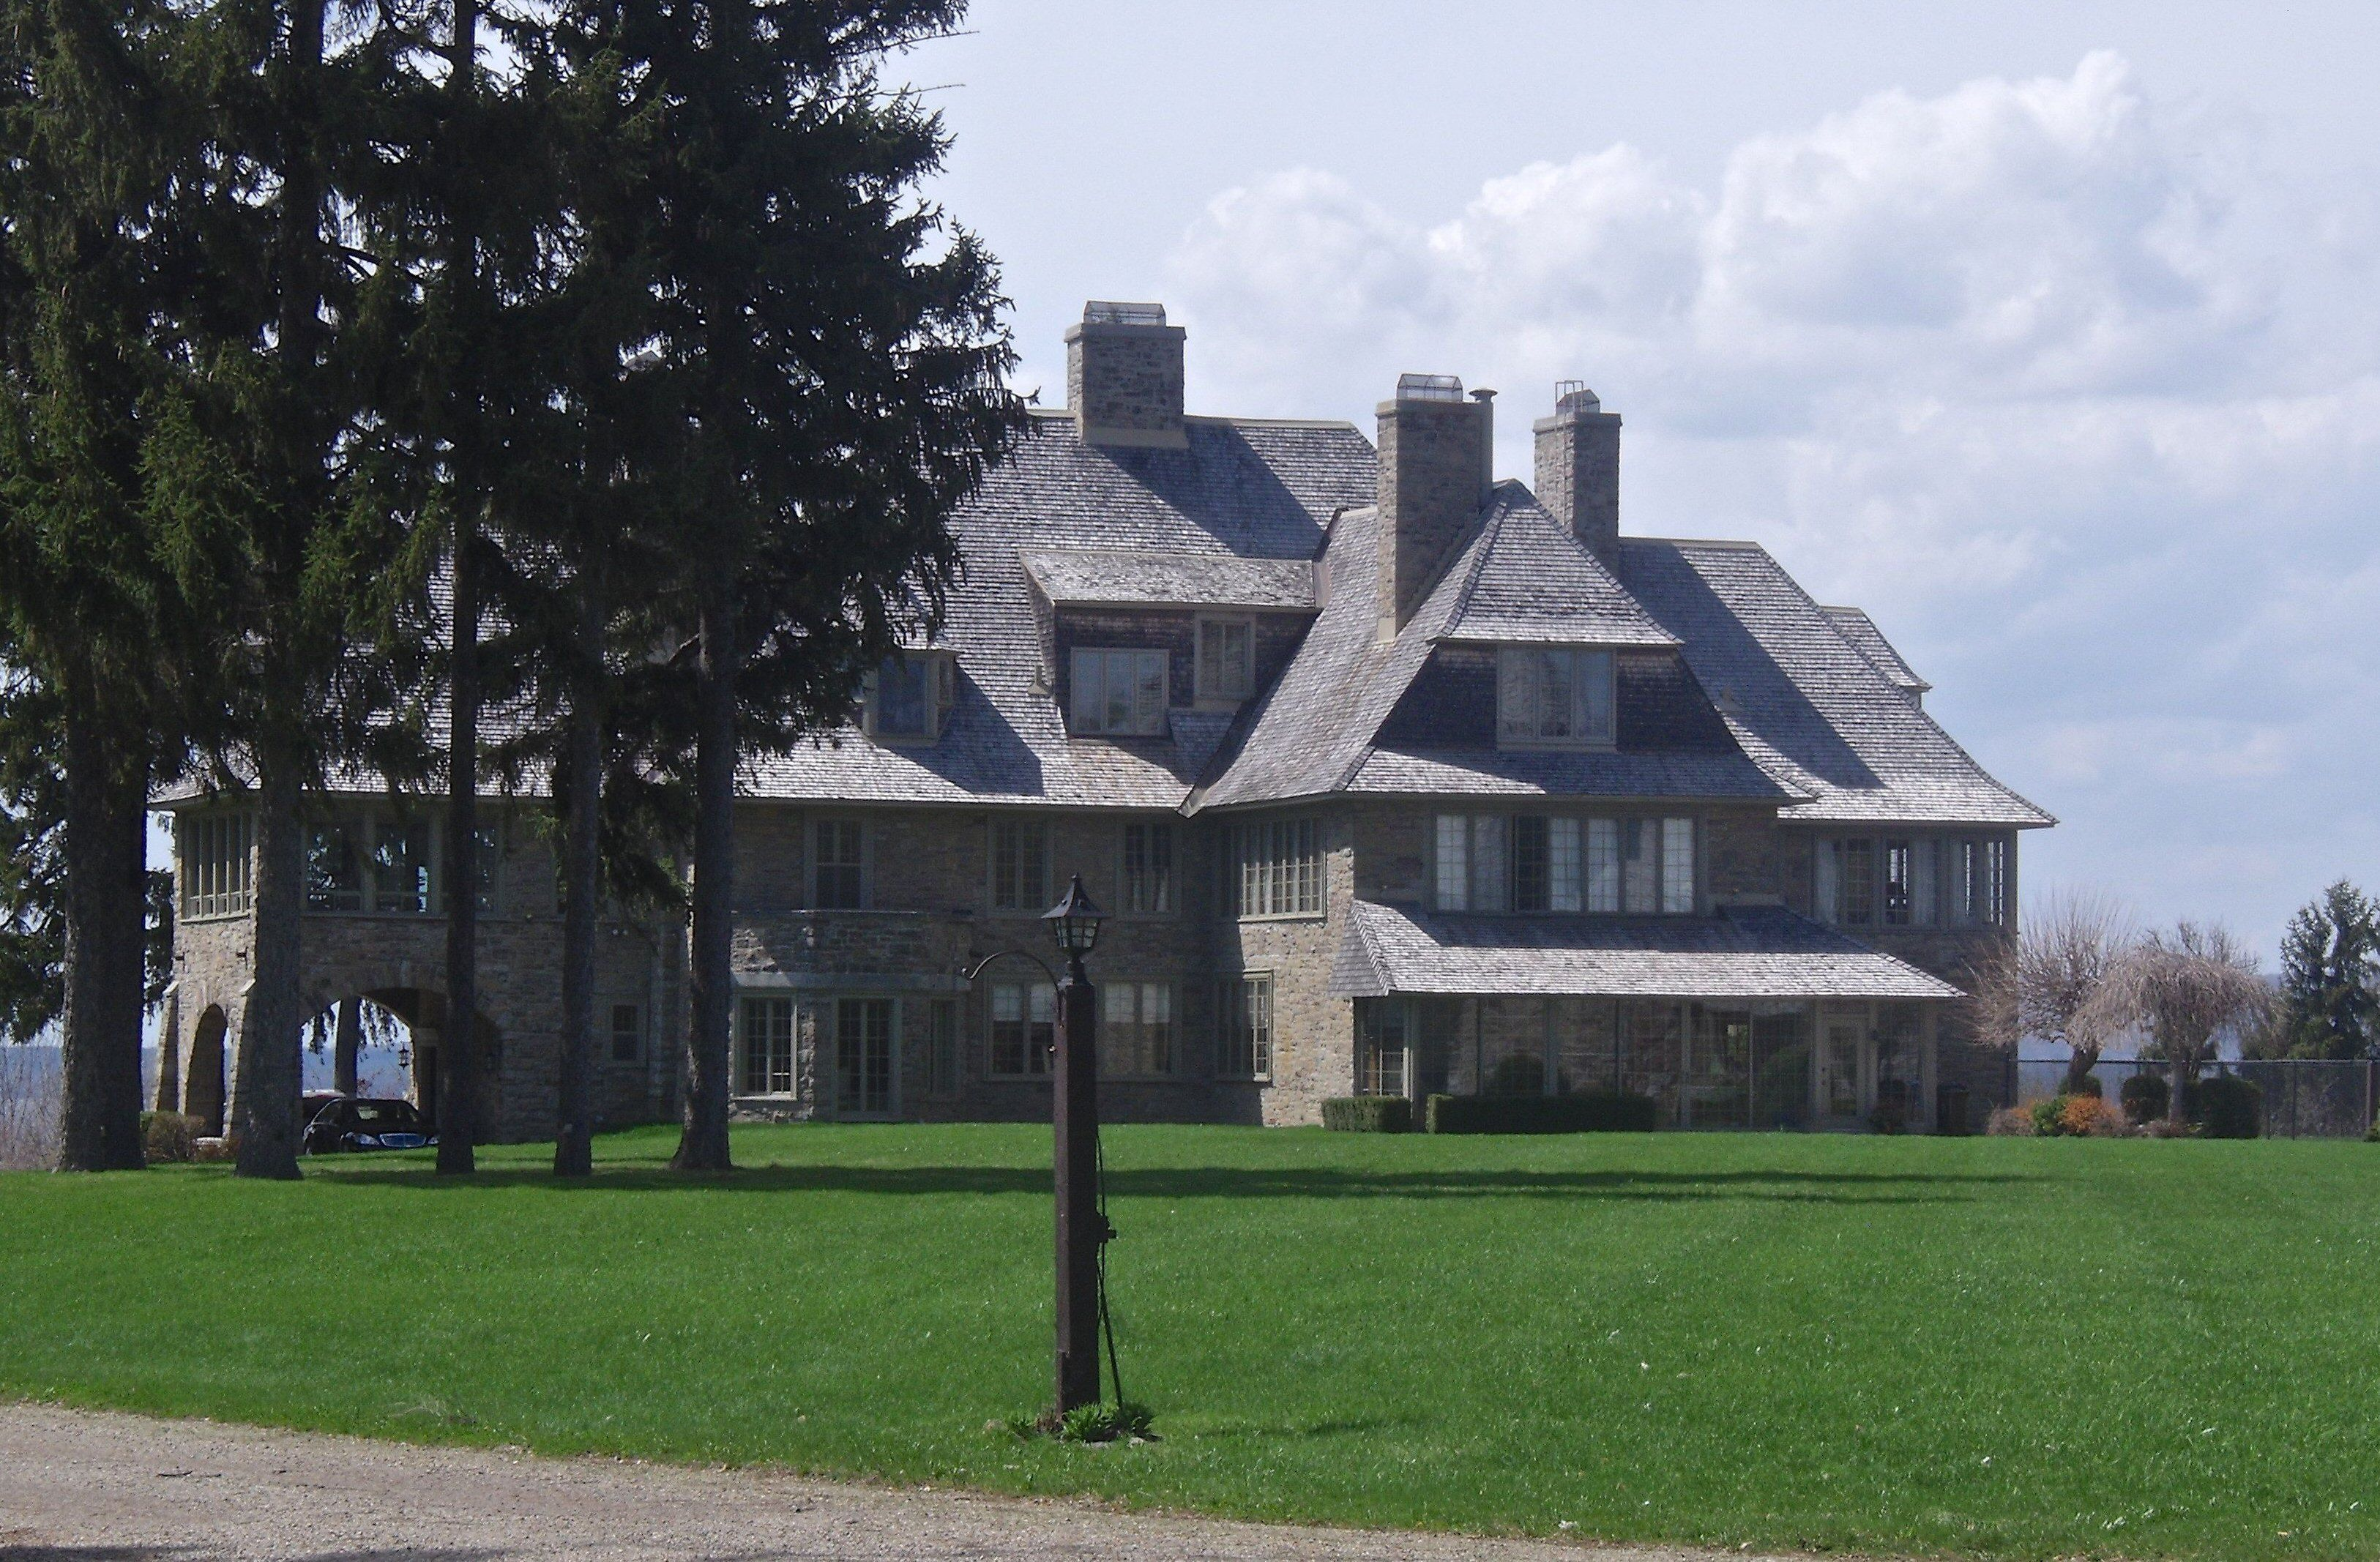 Shingle style without shingles stone shingle estate shed dormers